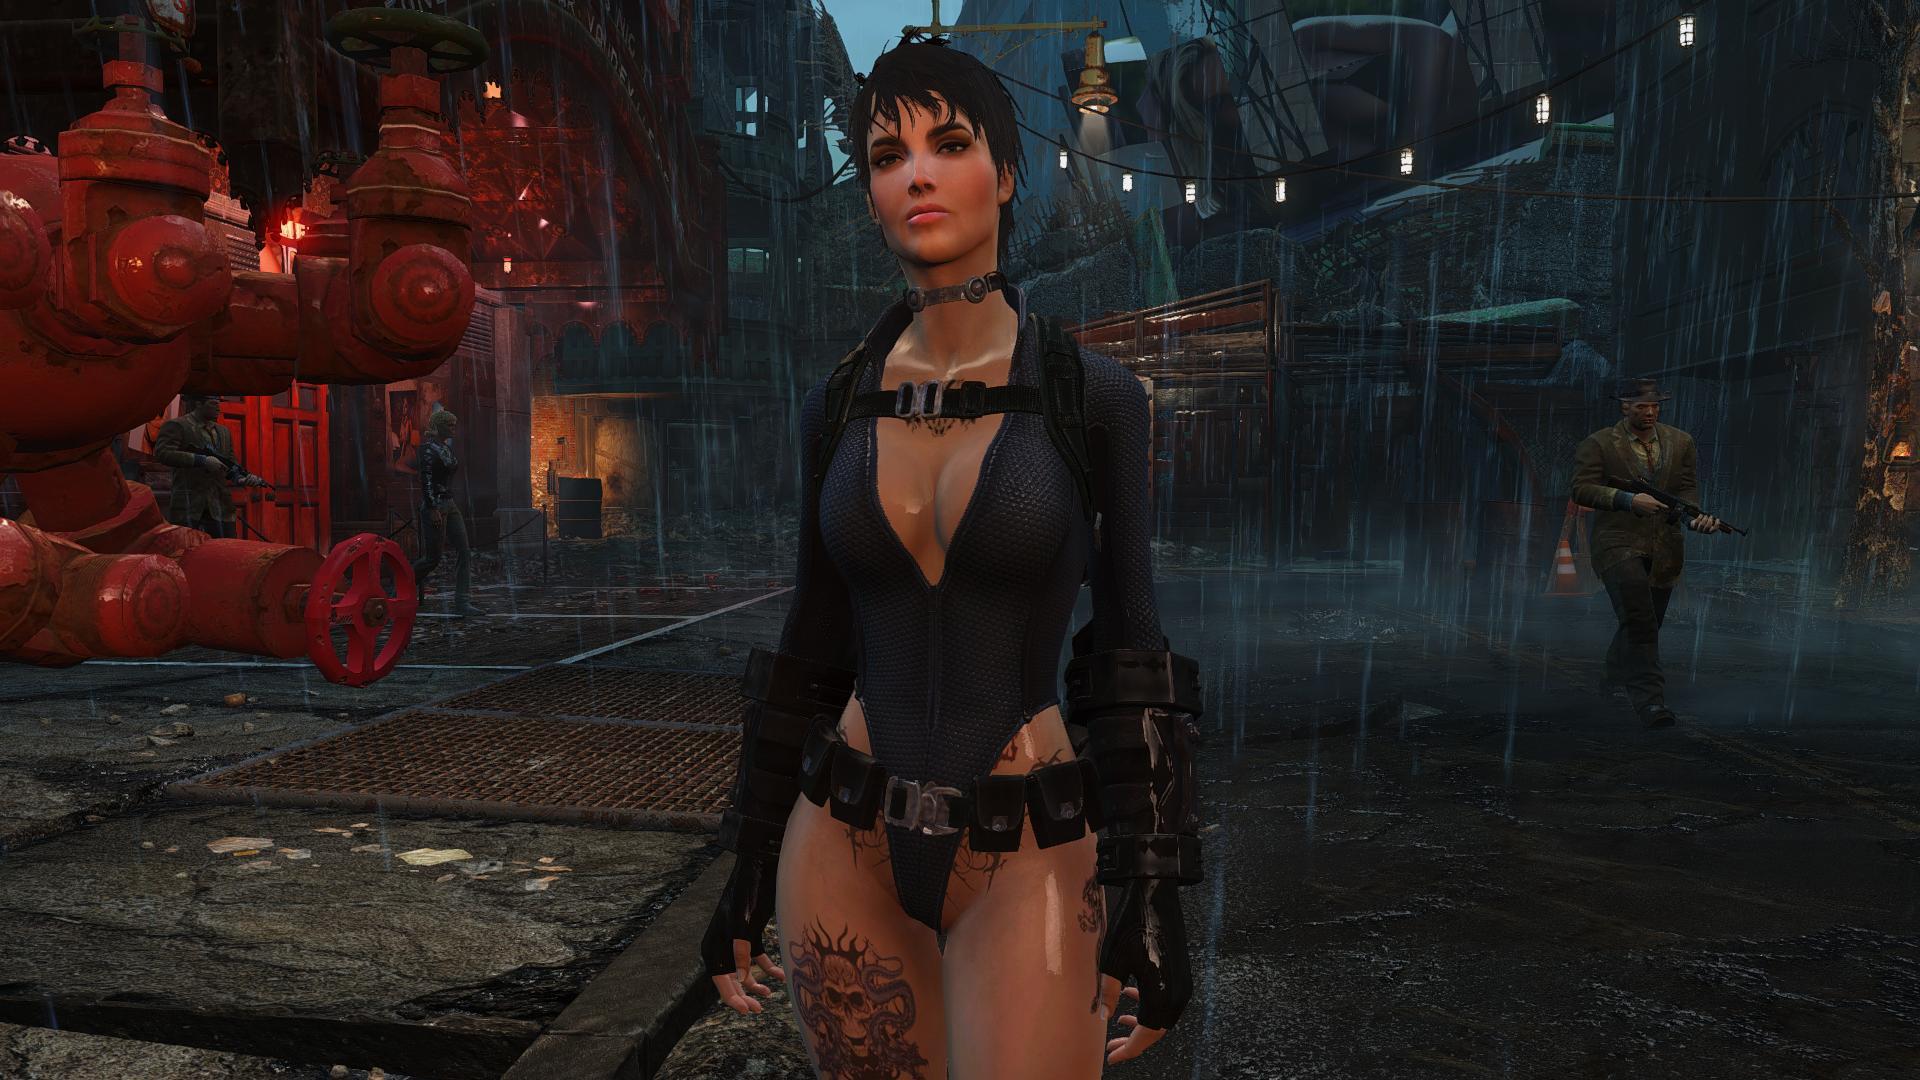 000592.Jpg - Fallout 4